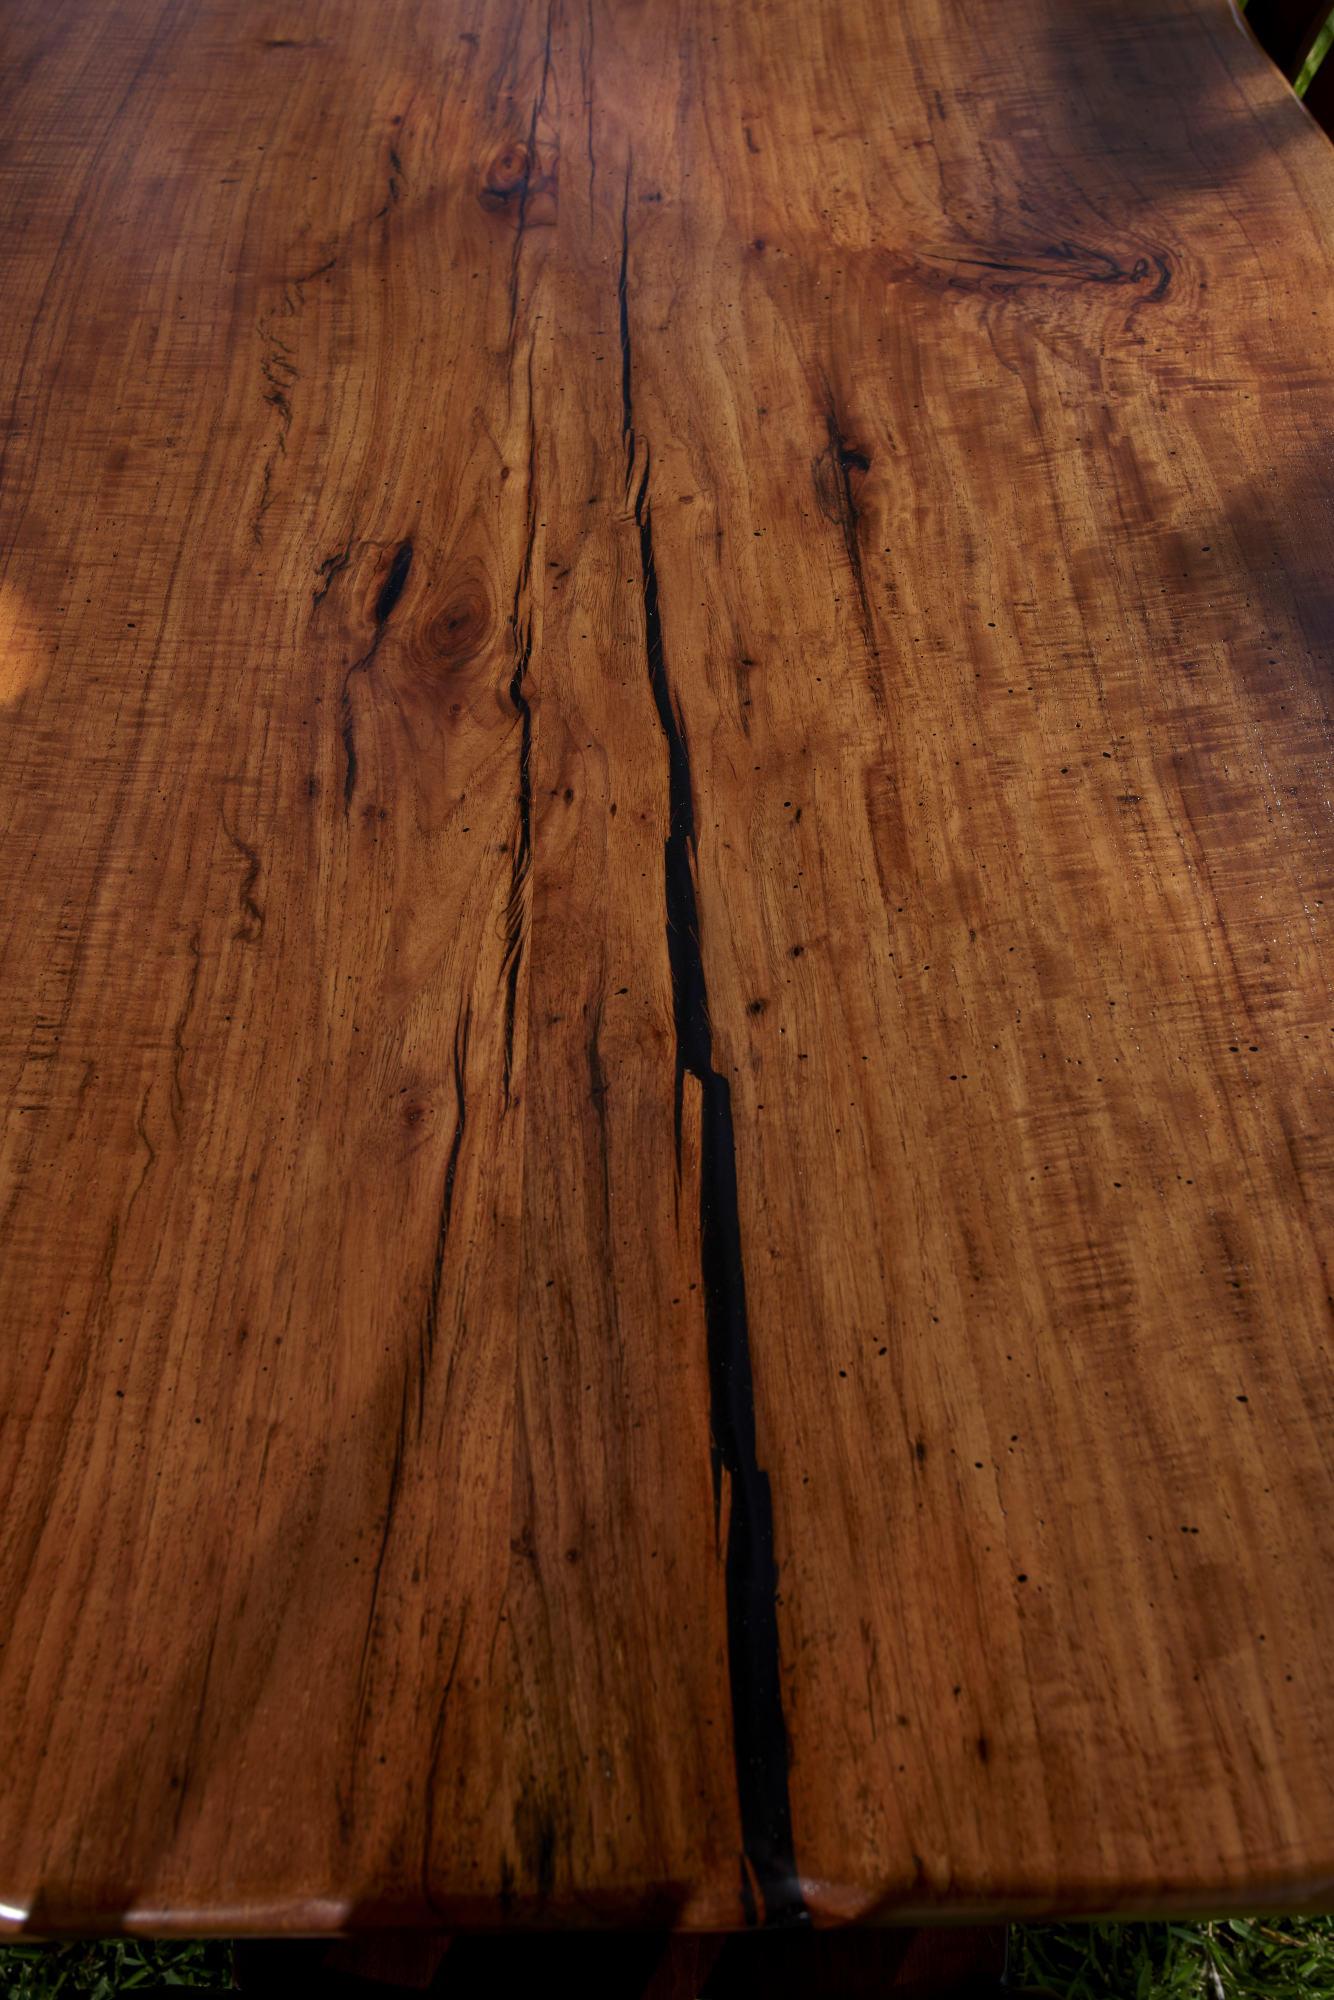 Rustic Furniture Product Photography - Hawkins Furniture in ...